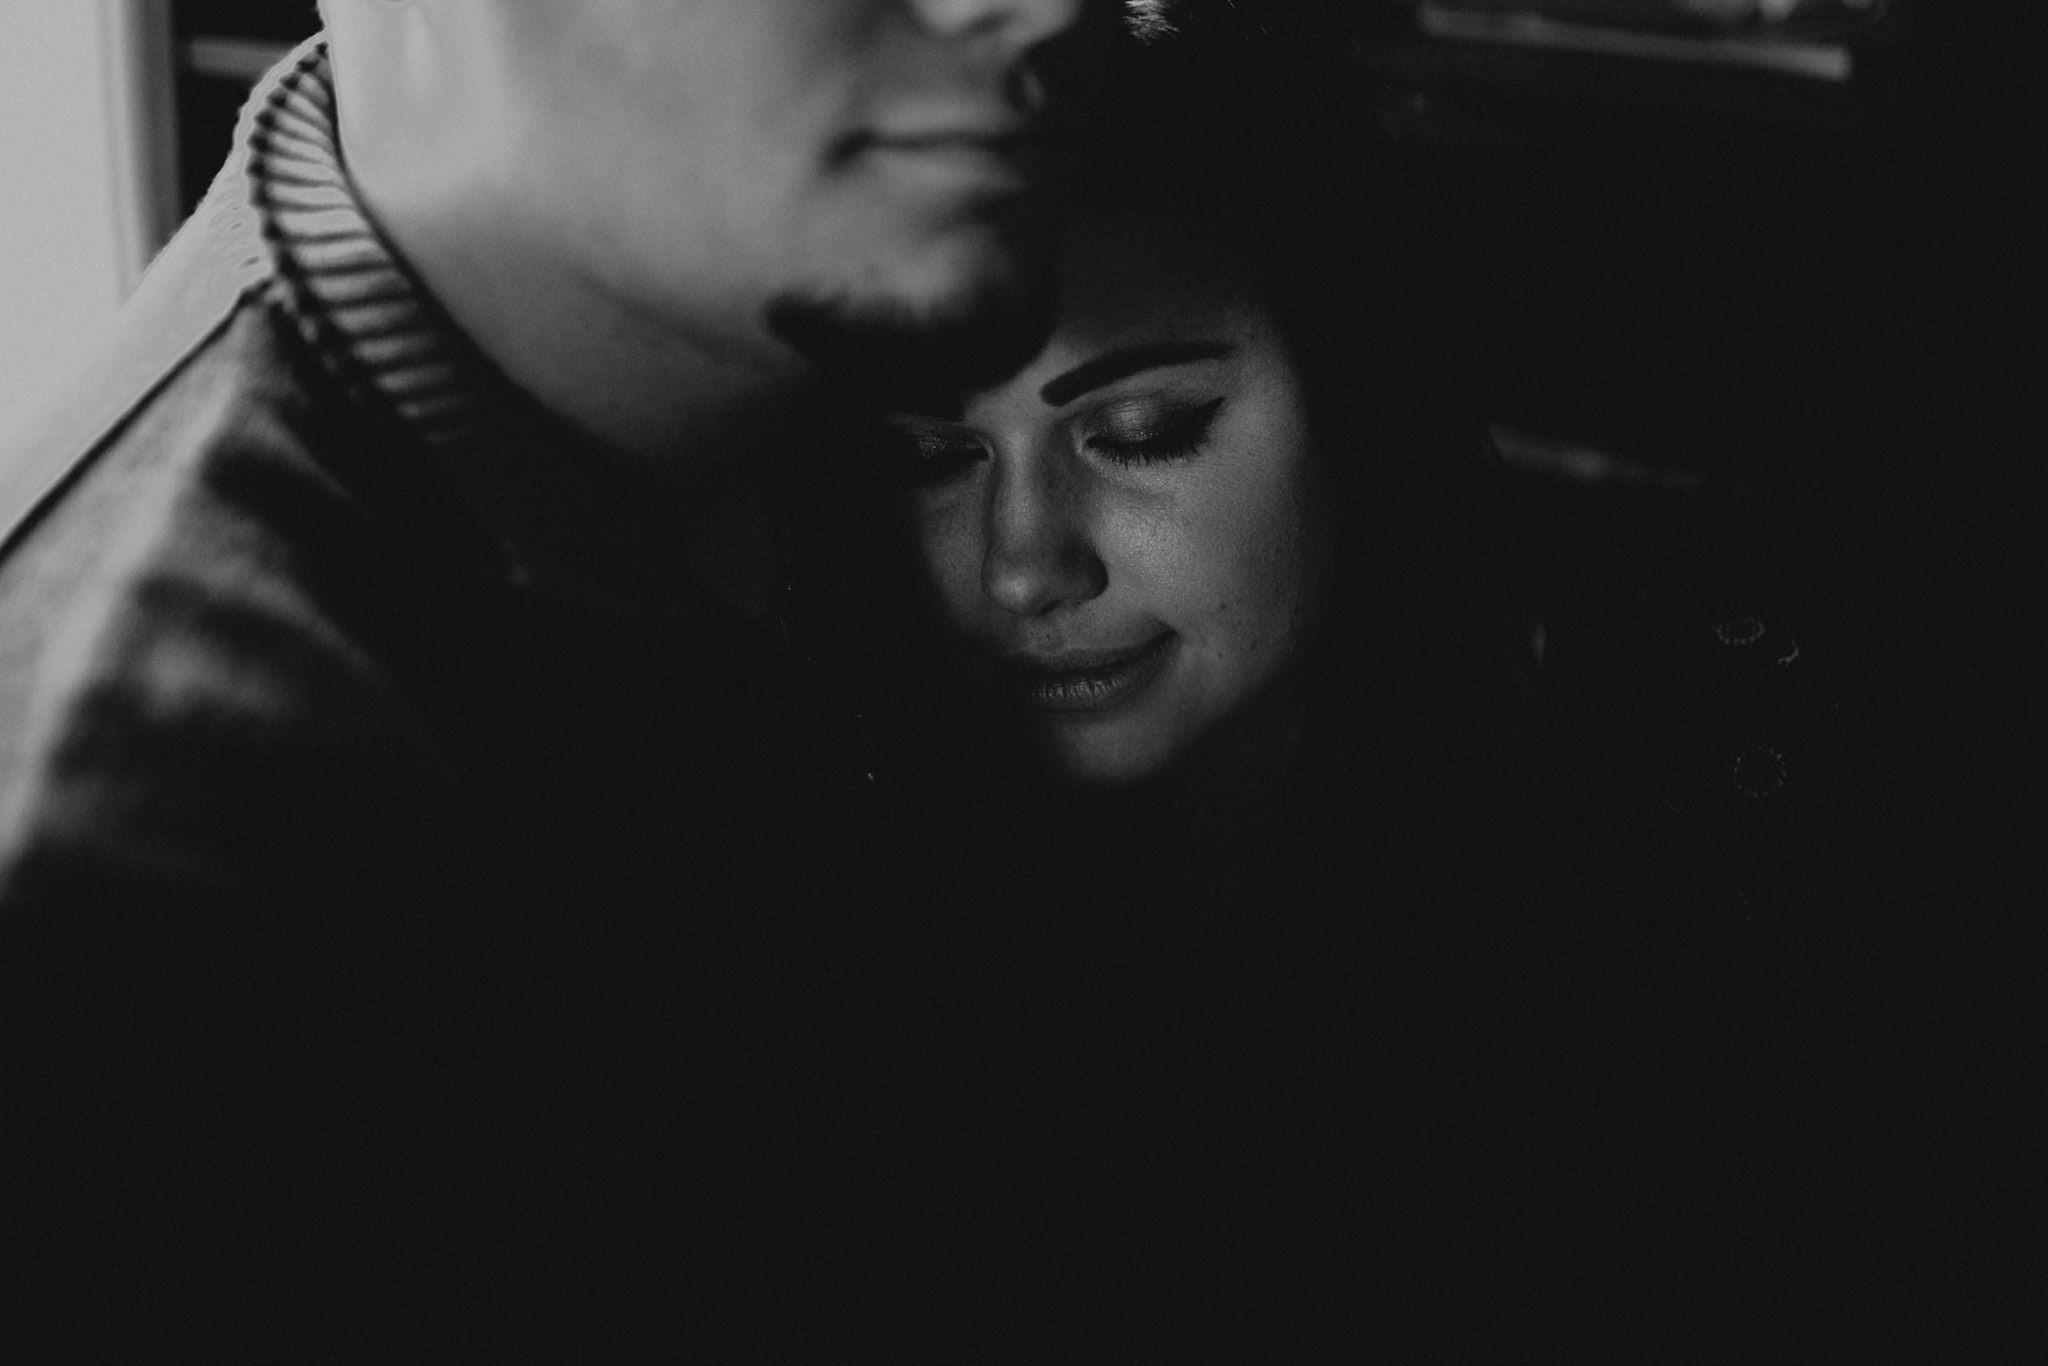 Taylor Lynn &Shane Jovanovic - Chicago Couple's Portraits -23 Likes